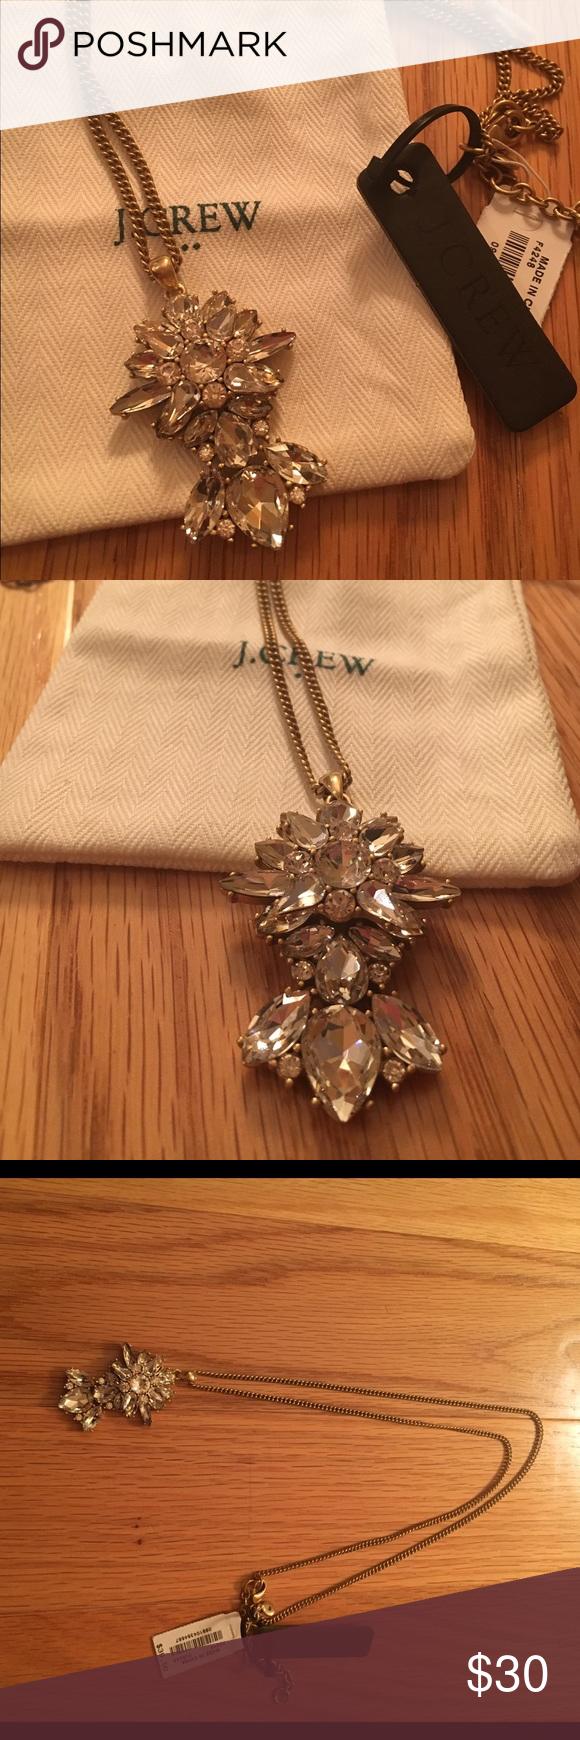 Newjcrew crystal pendant necklace nwt crystal pendant